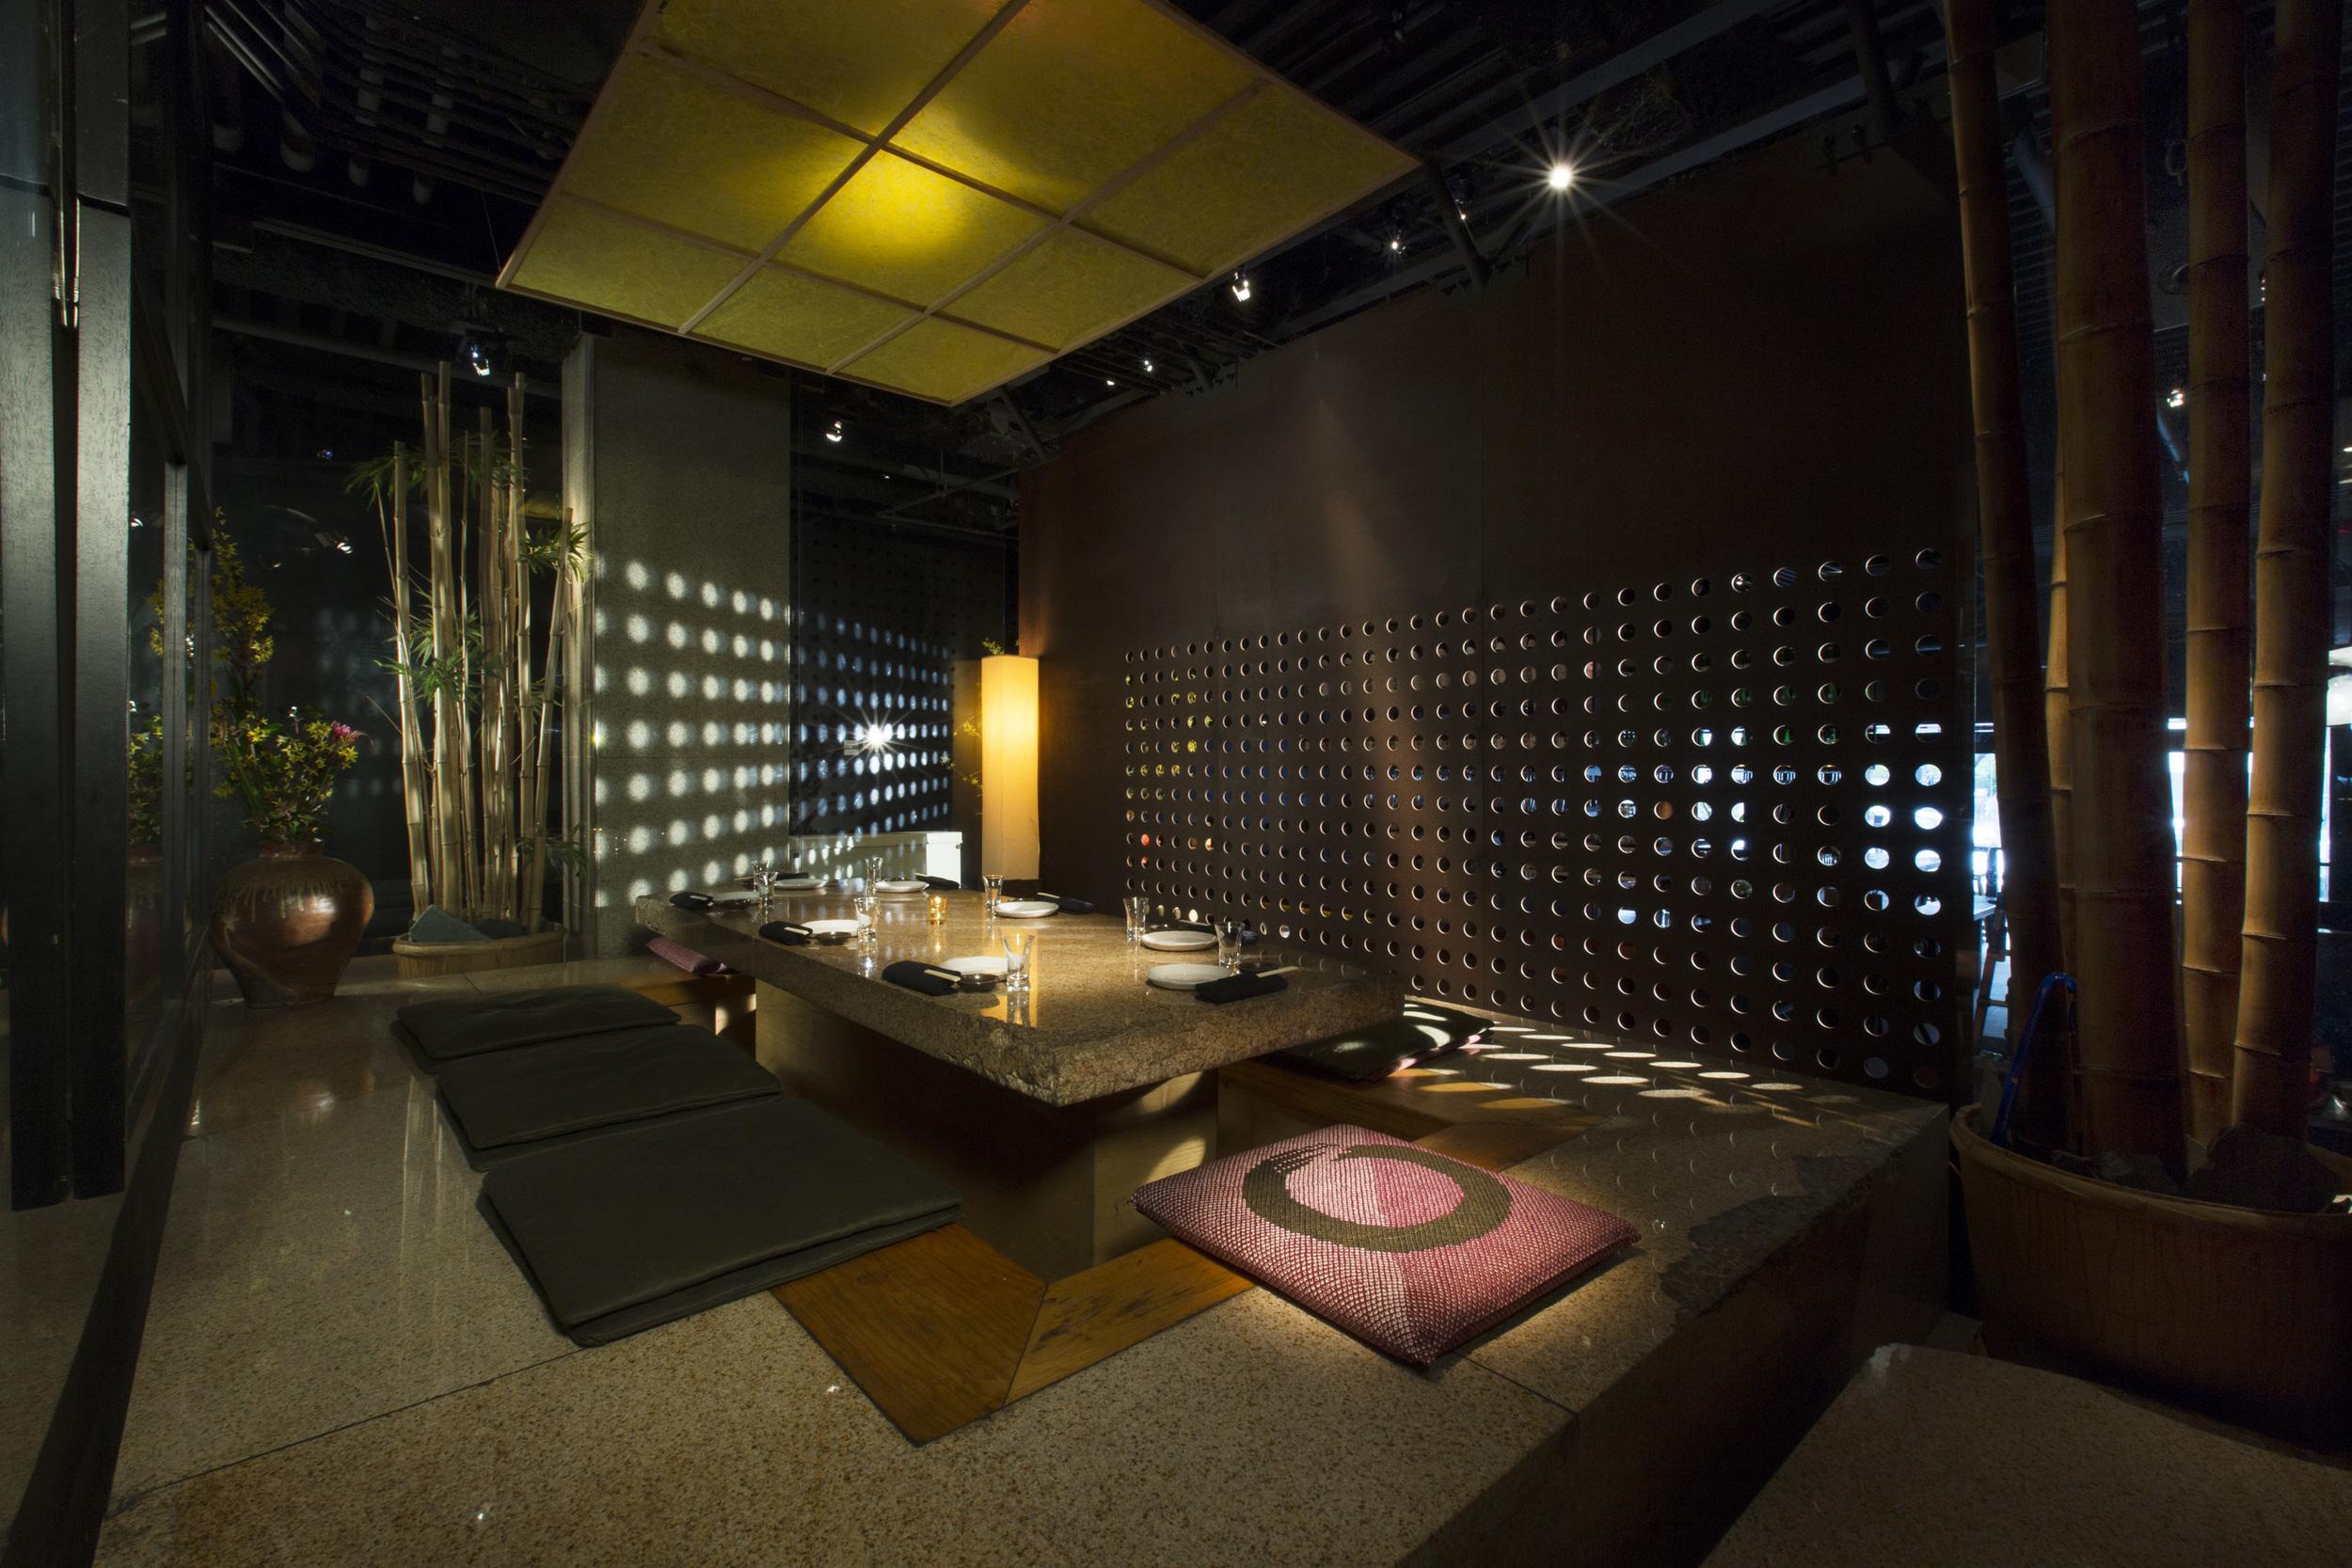 The Kotatsu Private Dining Room